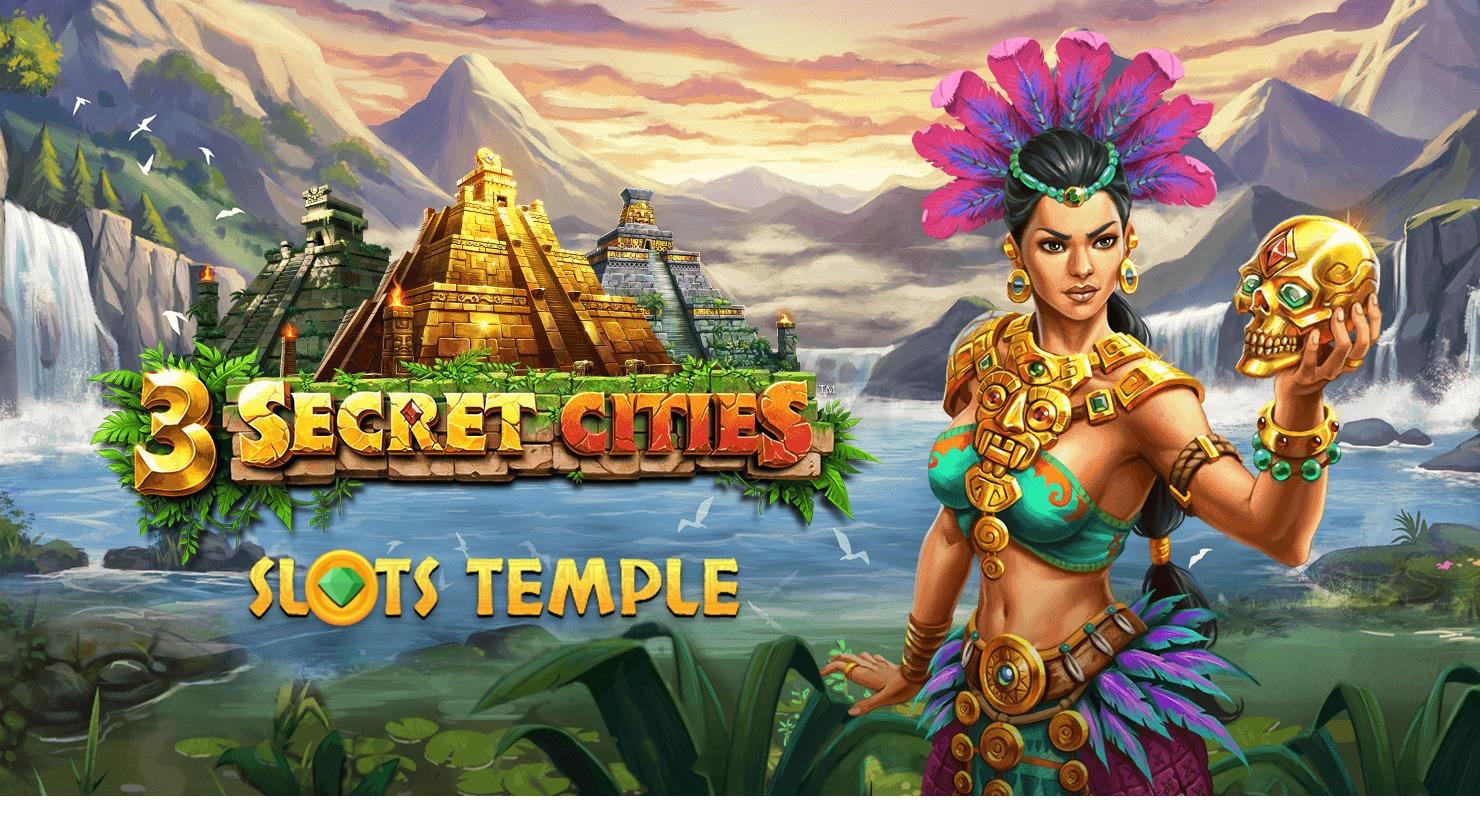 Slots Temple